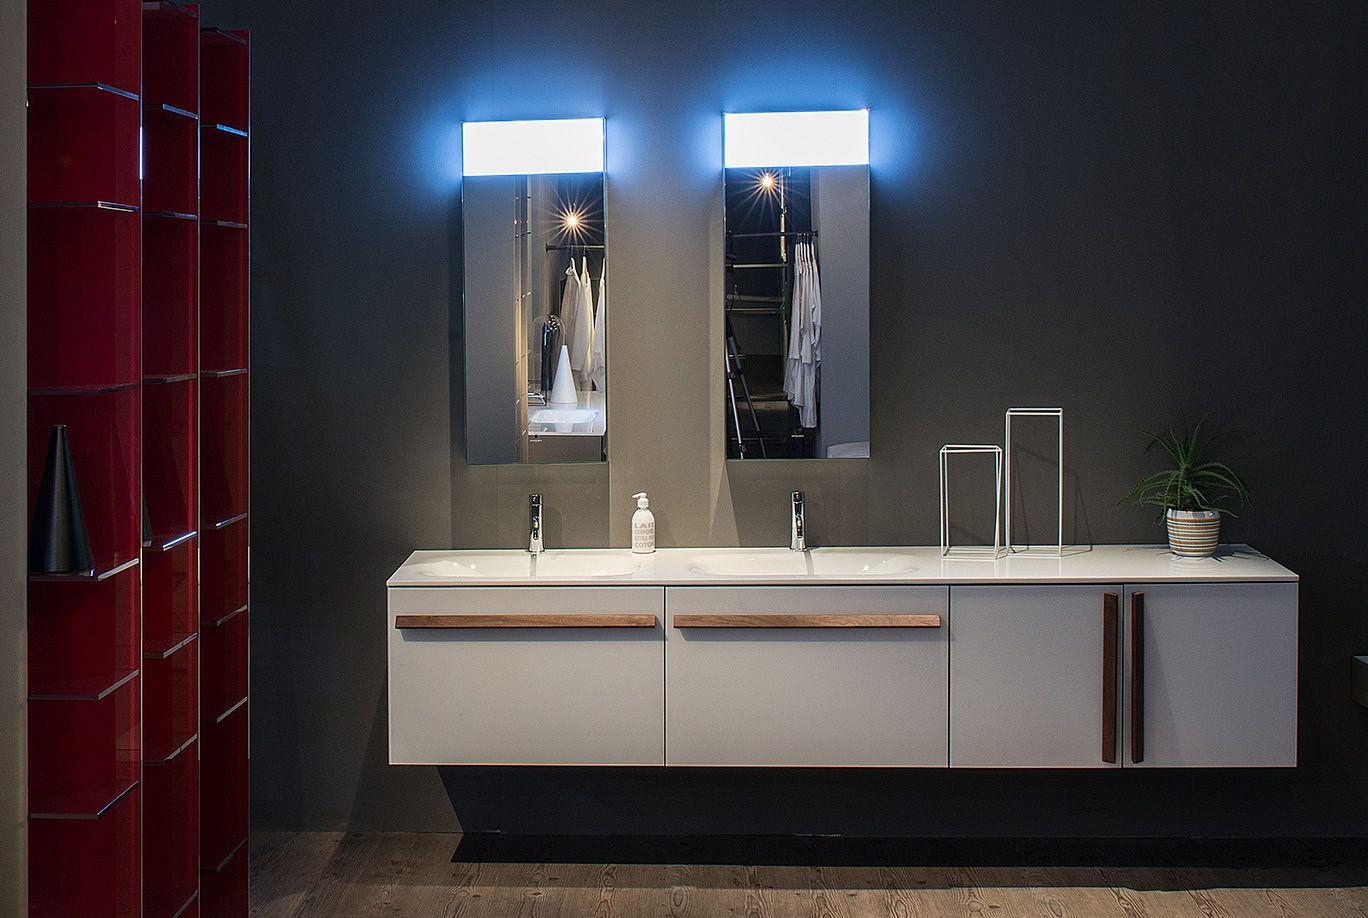 Artelinea Bagno ~ Simple white bath vanity by artelinea domino collection